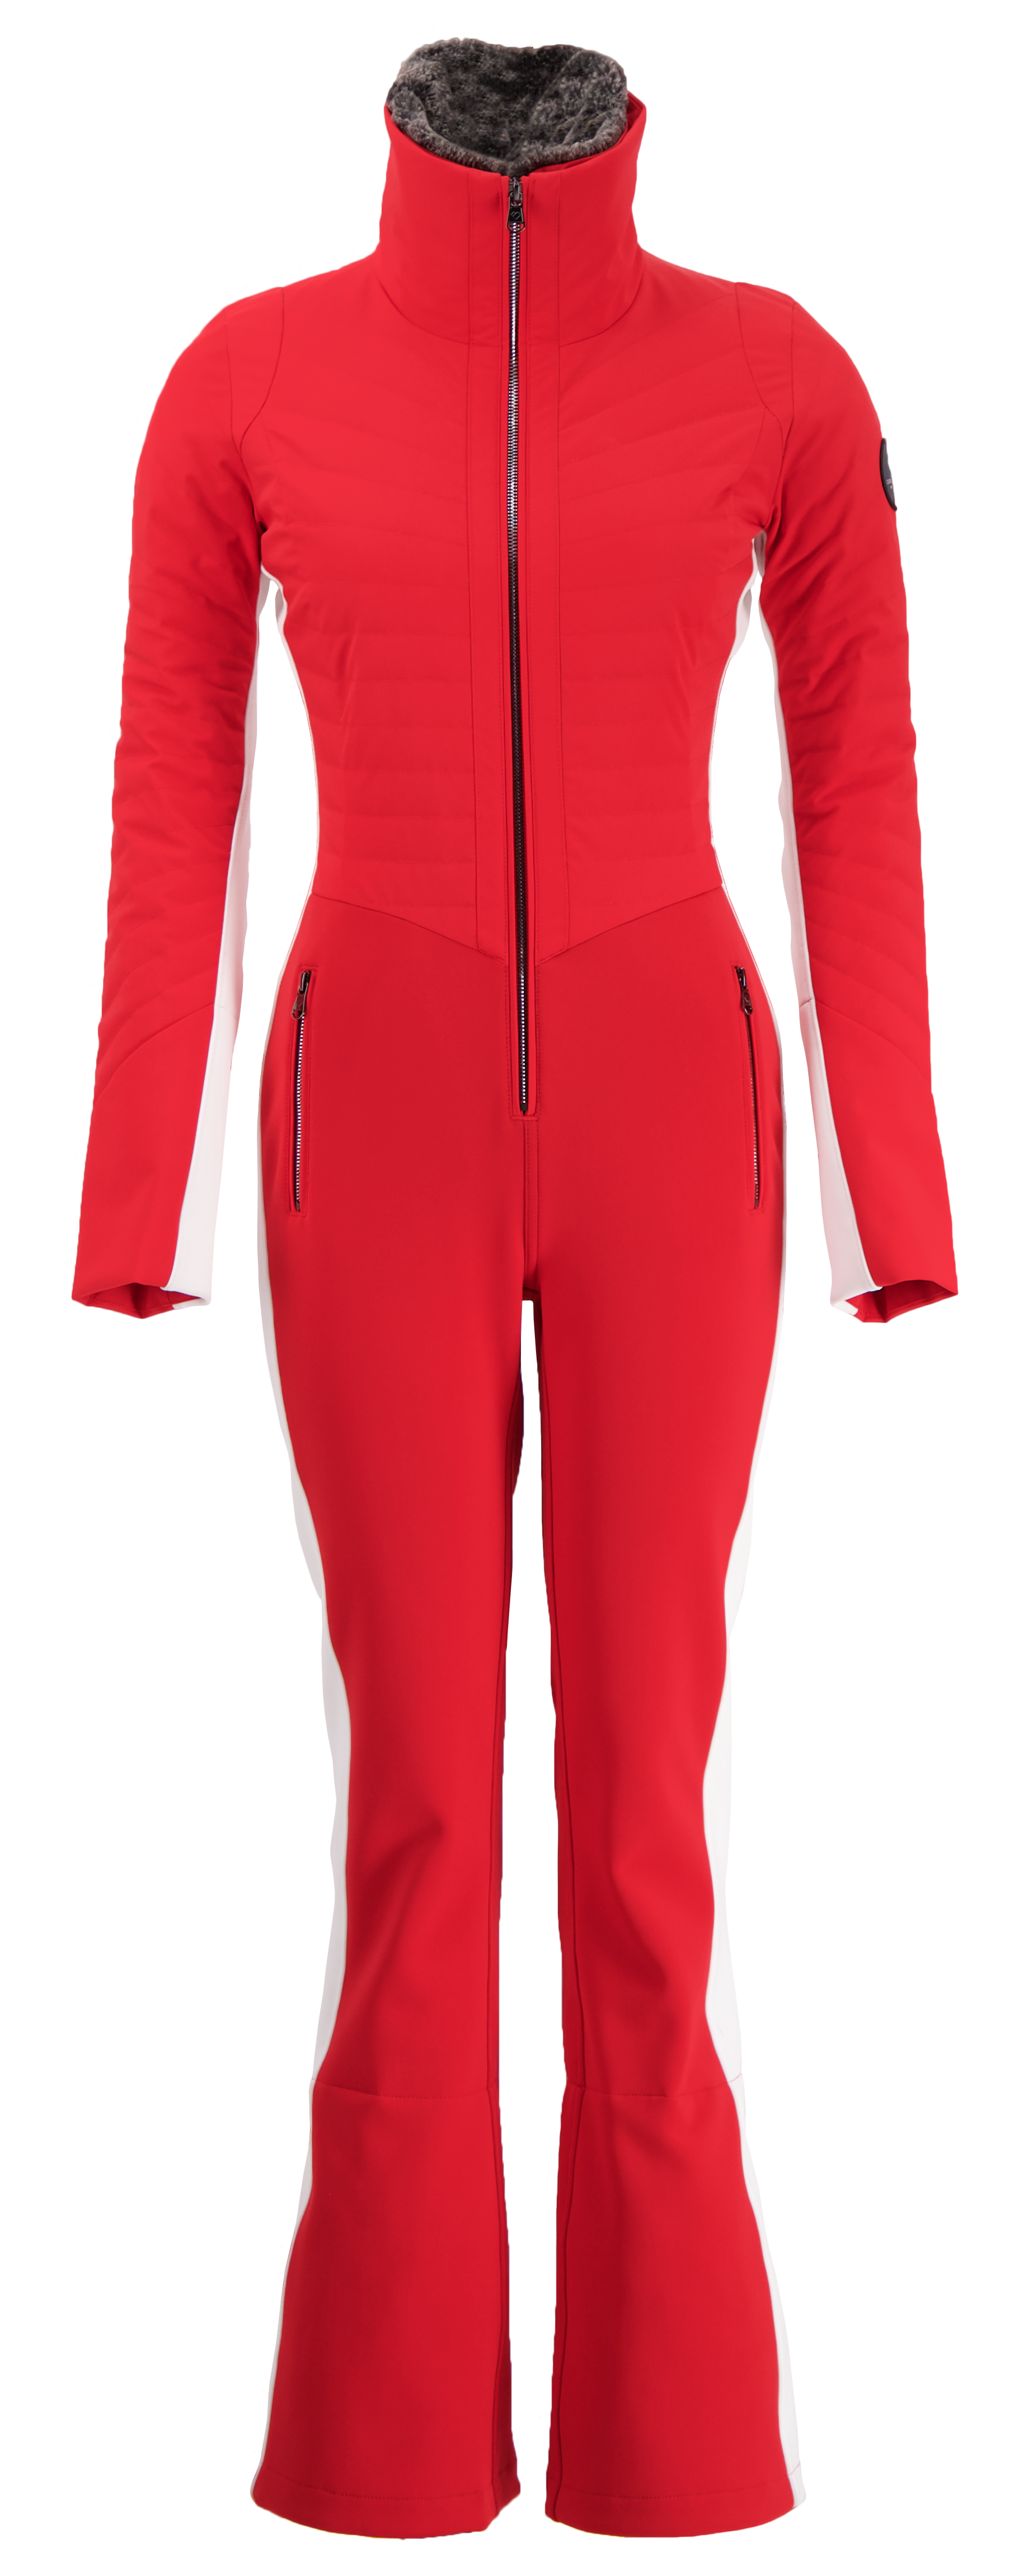 Franz Klammer | 1976 Olympics | Ski Racing